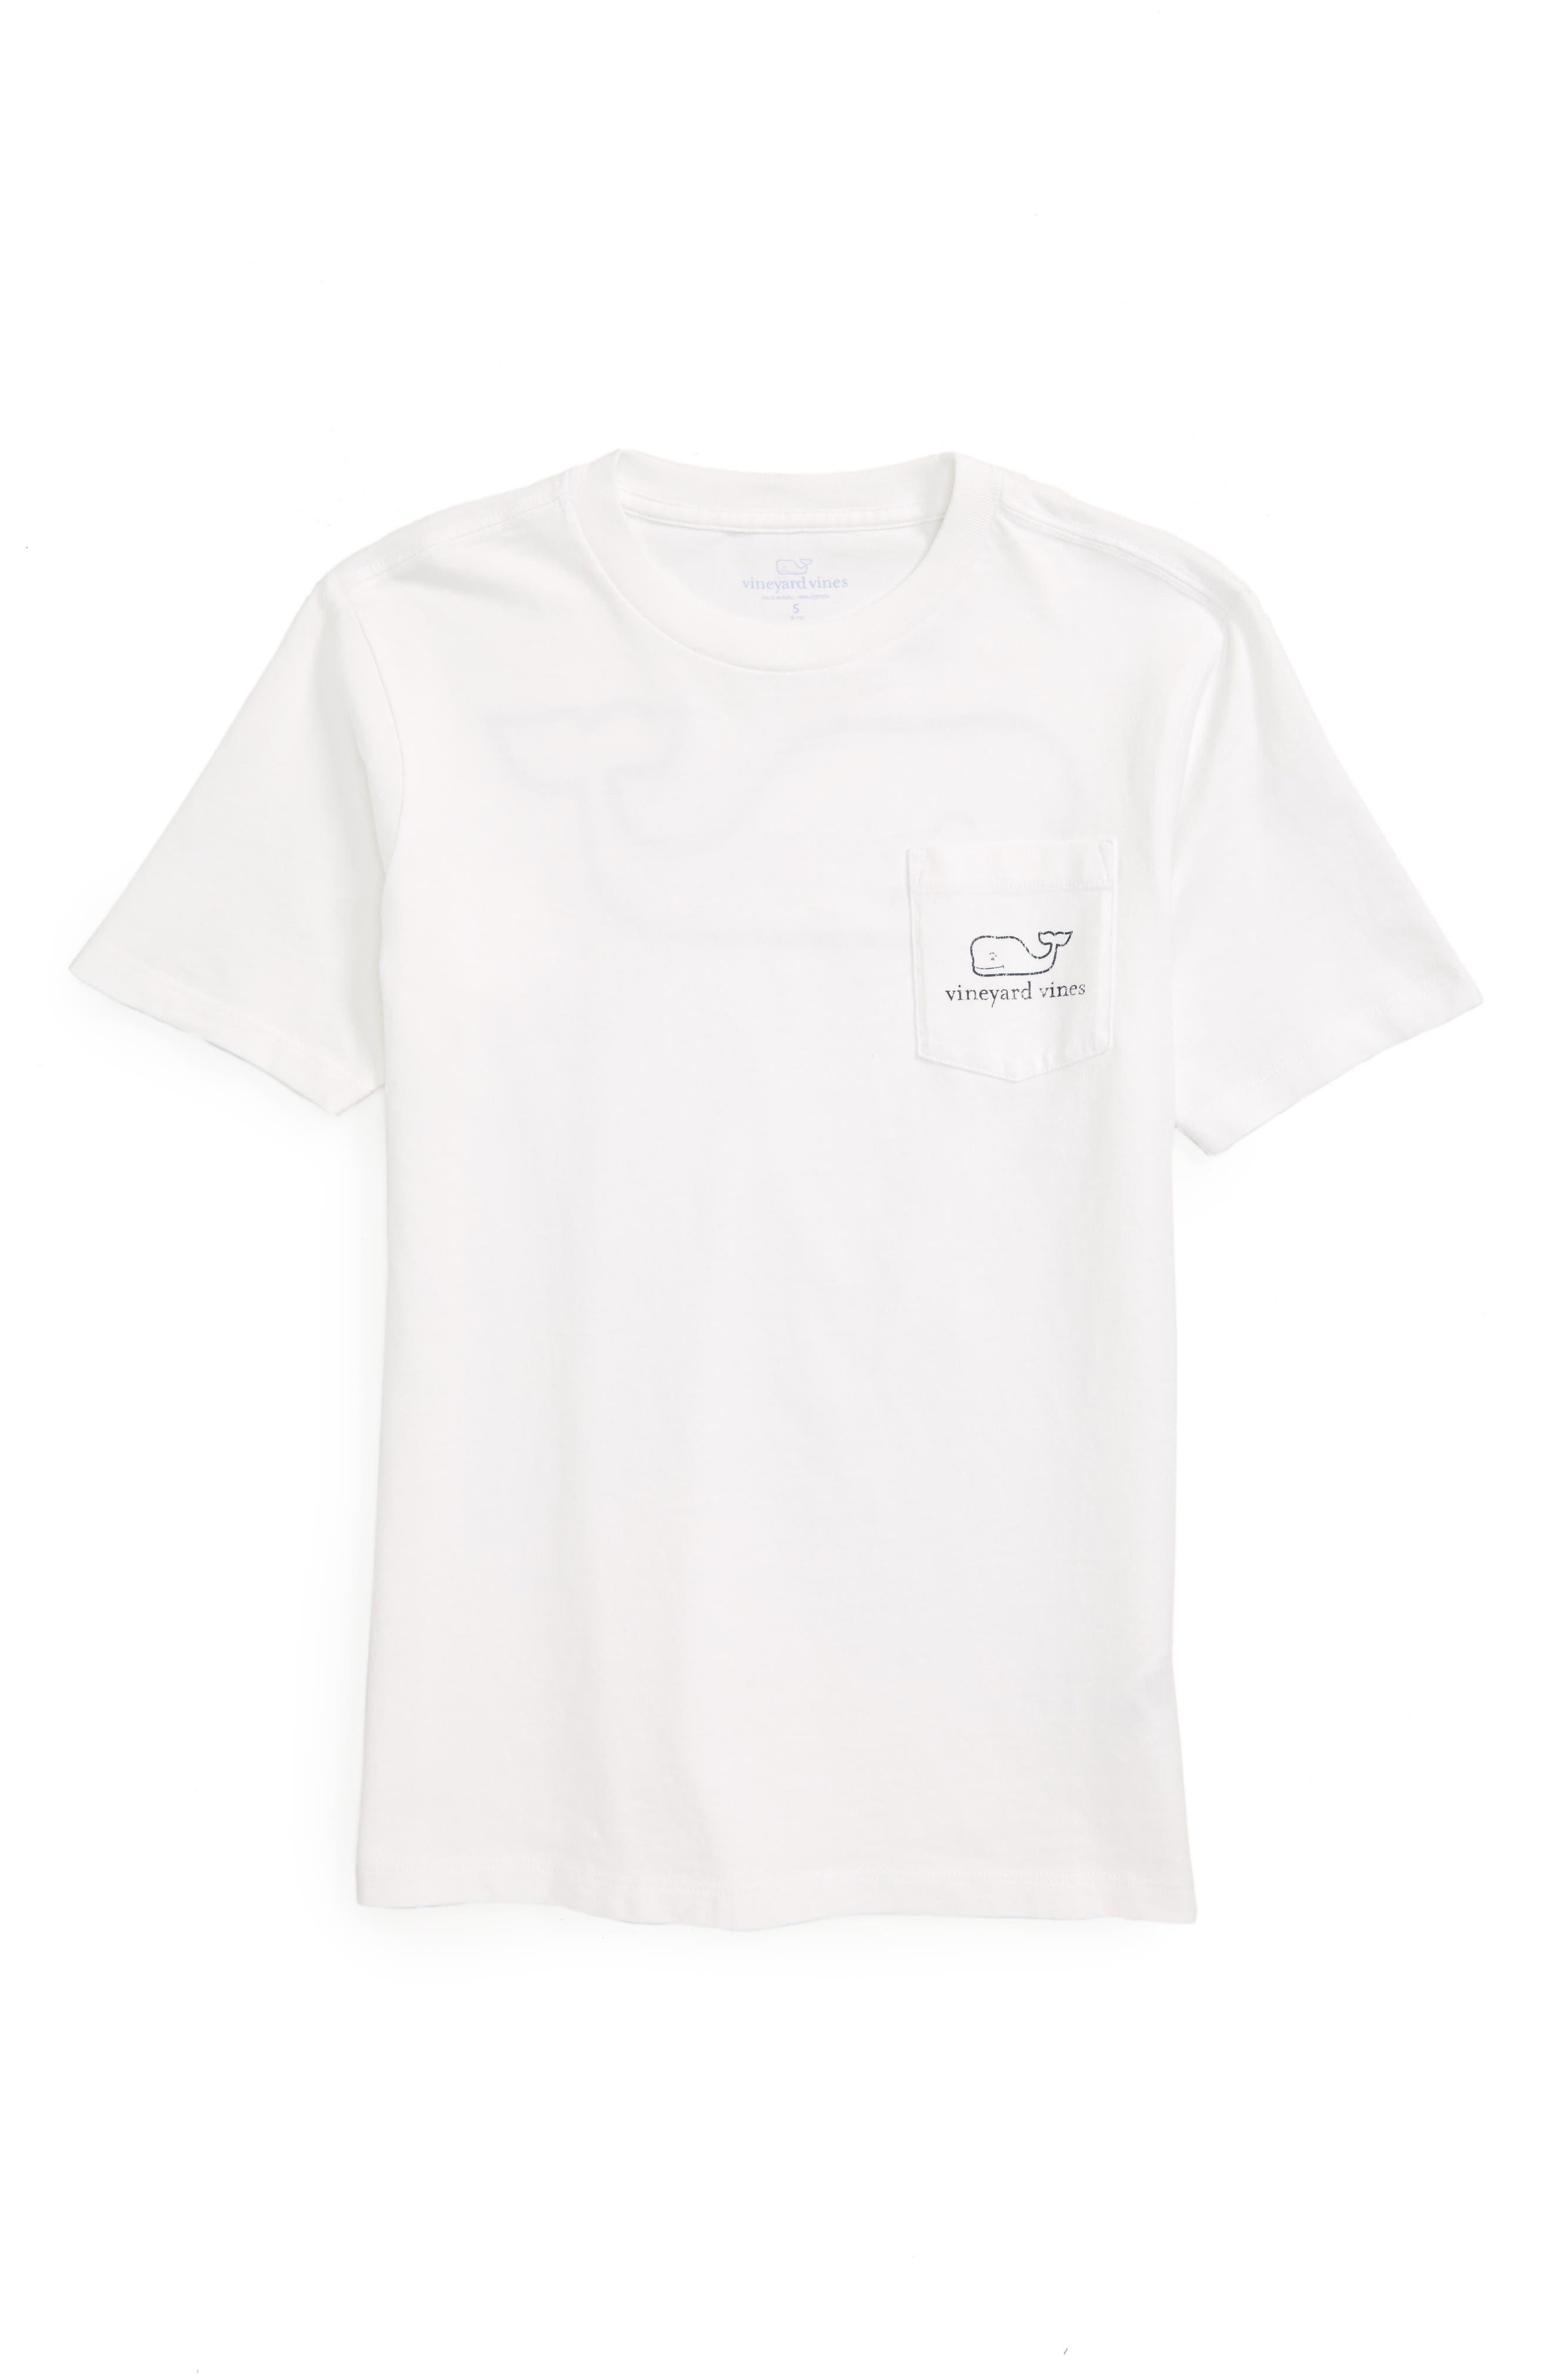 Alternate Image 1 Selected - vineyard vines Whale T-Shirt (Toddler Boys, Little Boys & Big Boys)